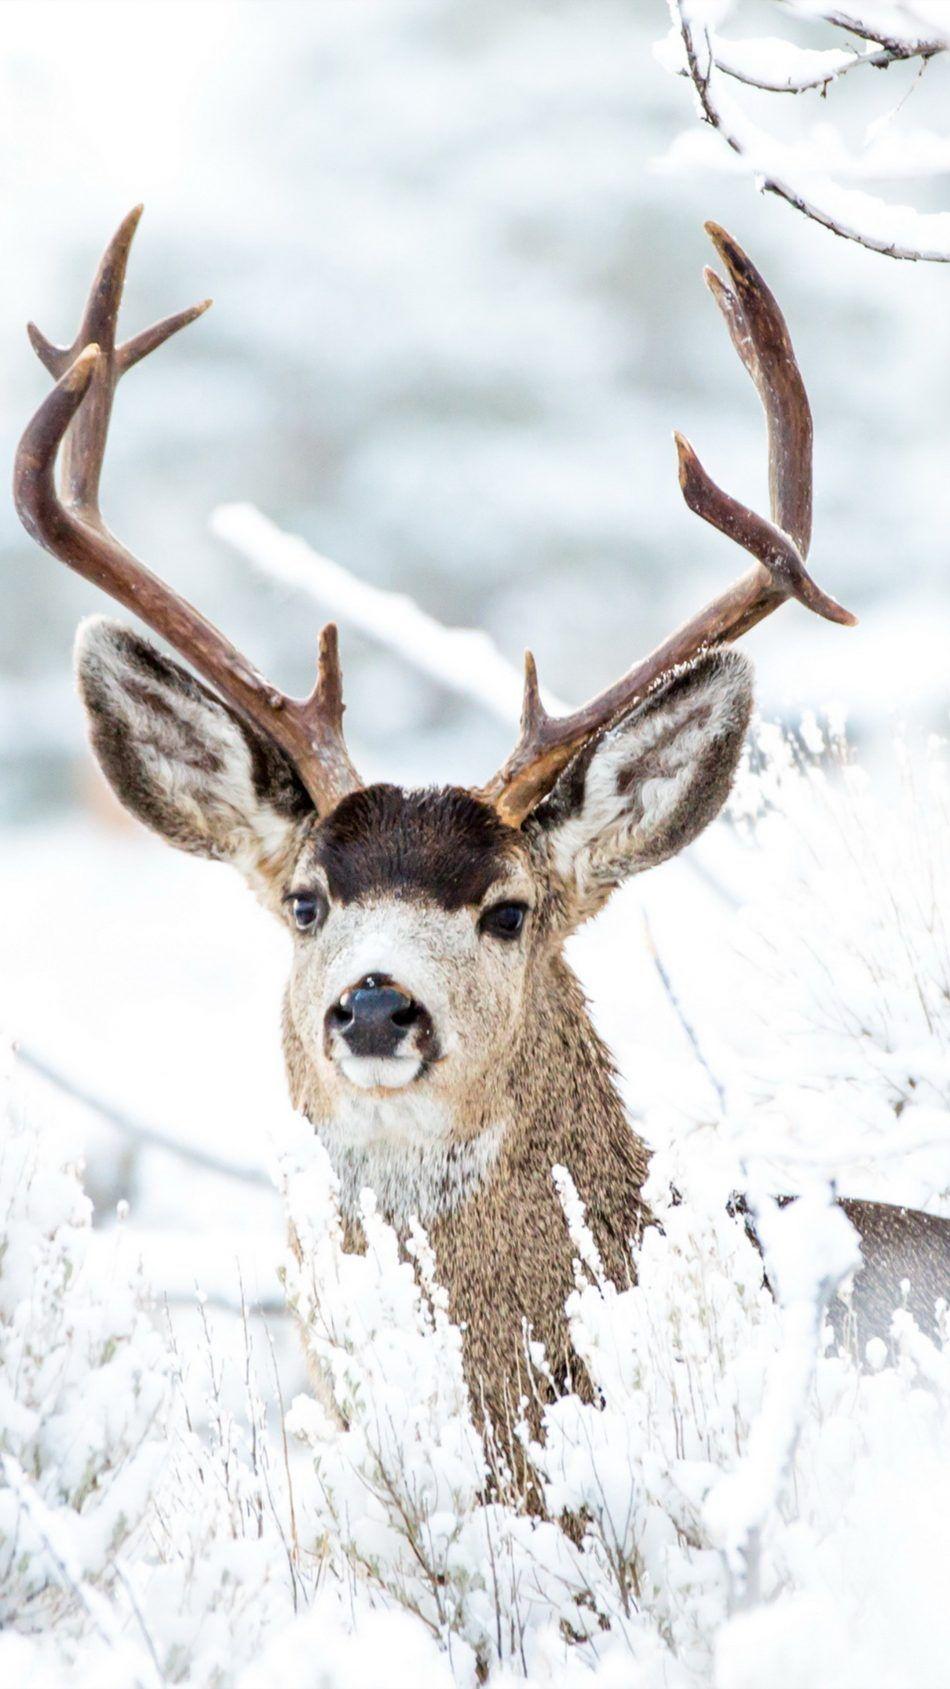 Deer Winter Snow 4k Ultra Hd Mobile Wallpaper Animals Images Snow Animals Deer Wallpaper